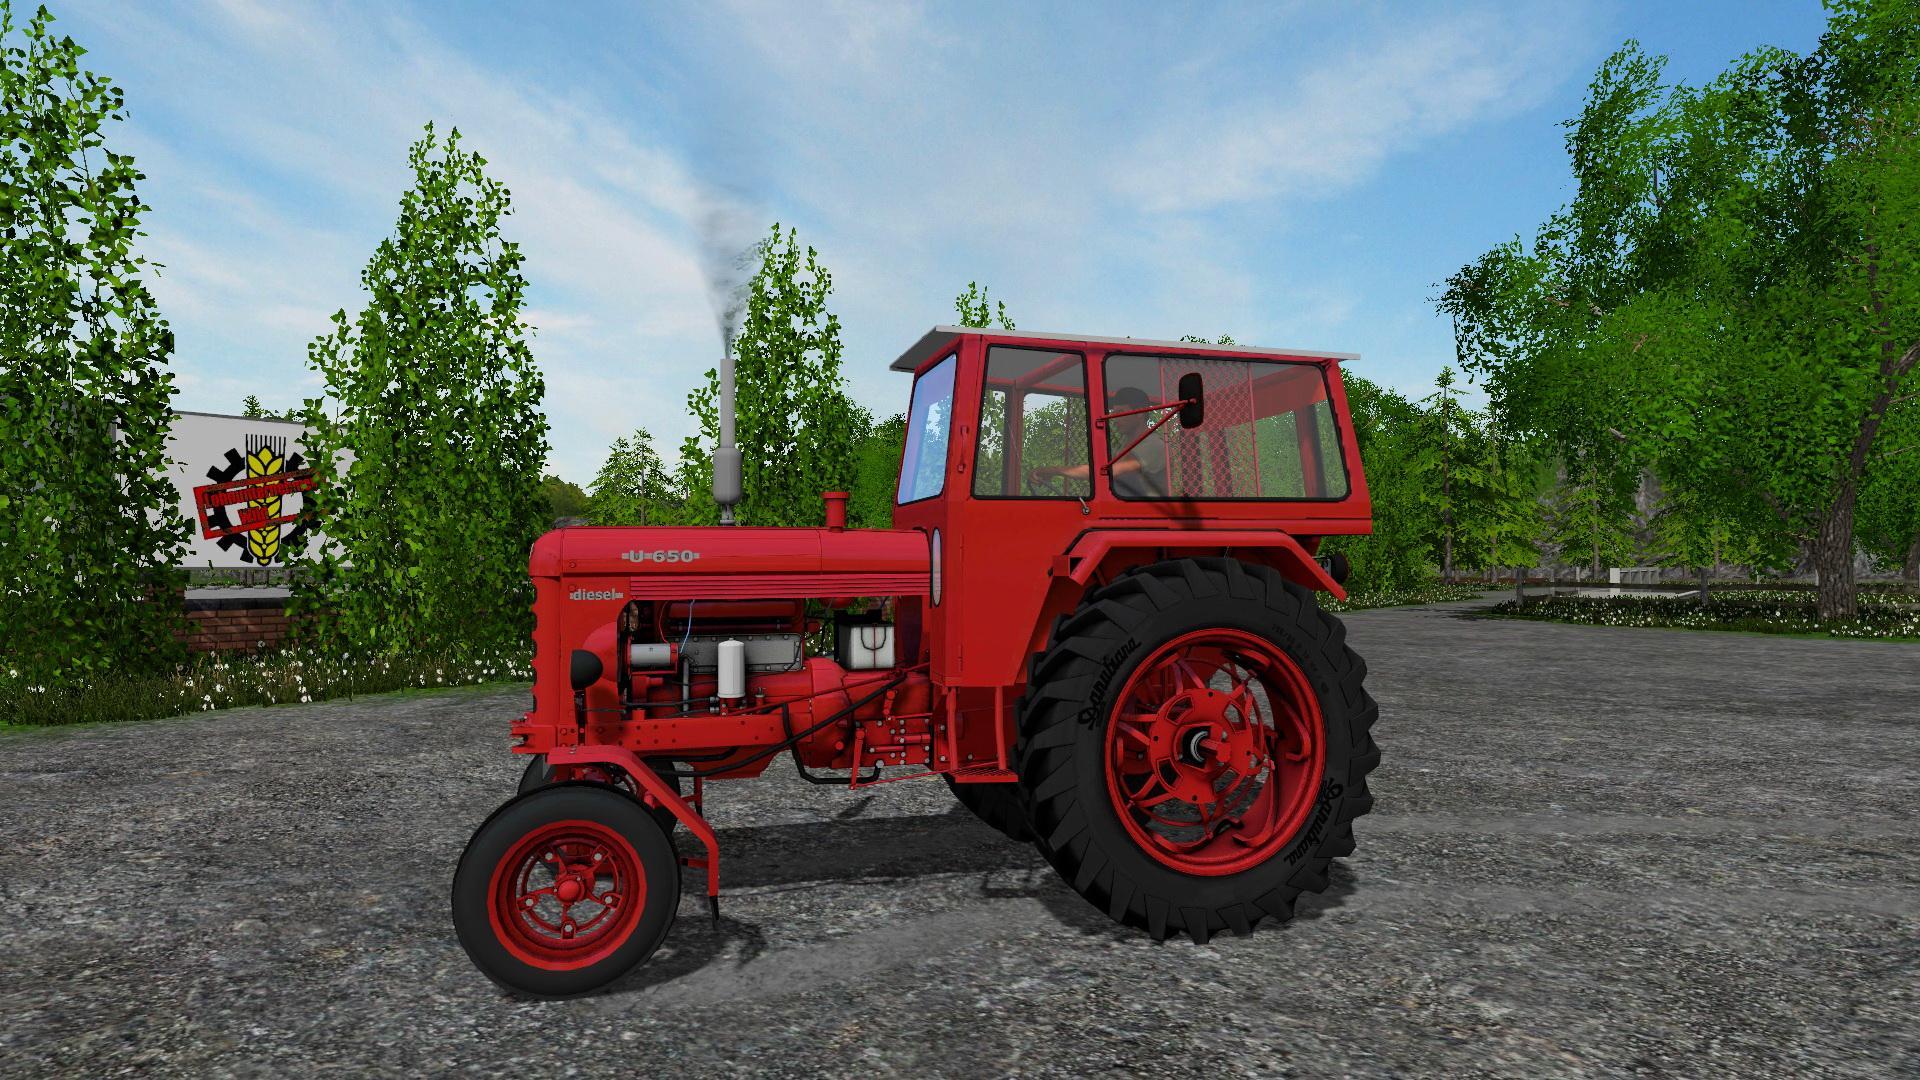 Farming Simulator Tractors : Romanian old tractor utb v farming simulator